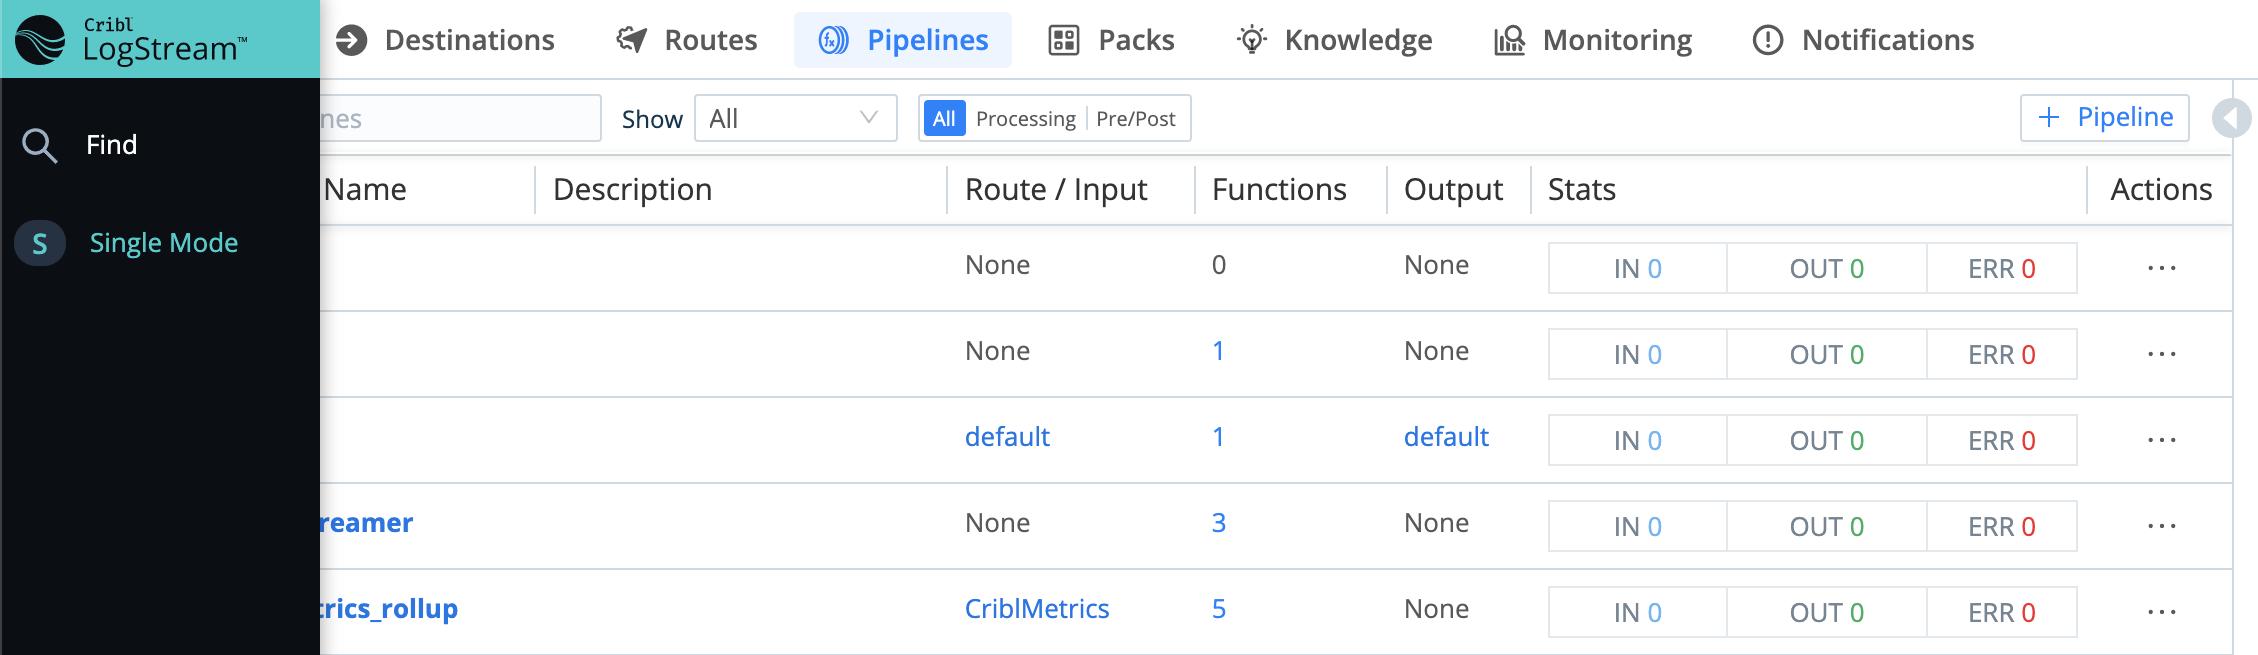 Single-instance deployment: anchored top menu